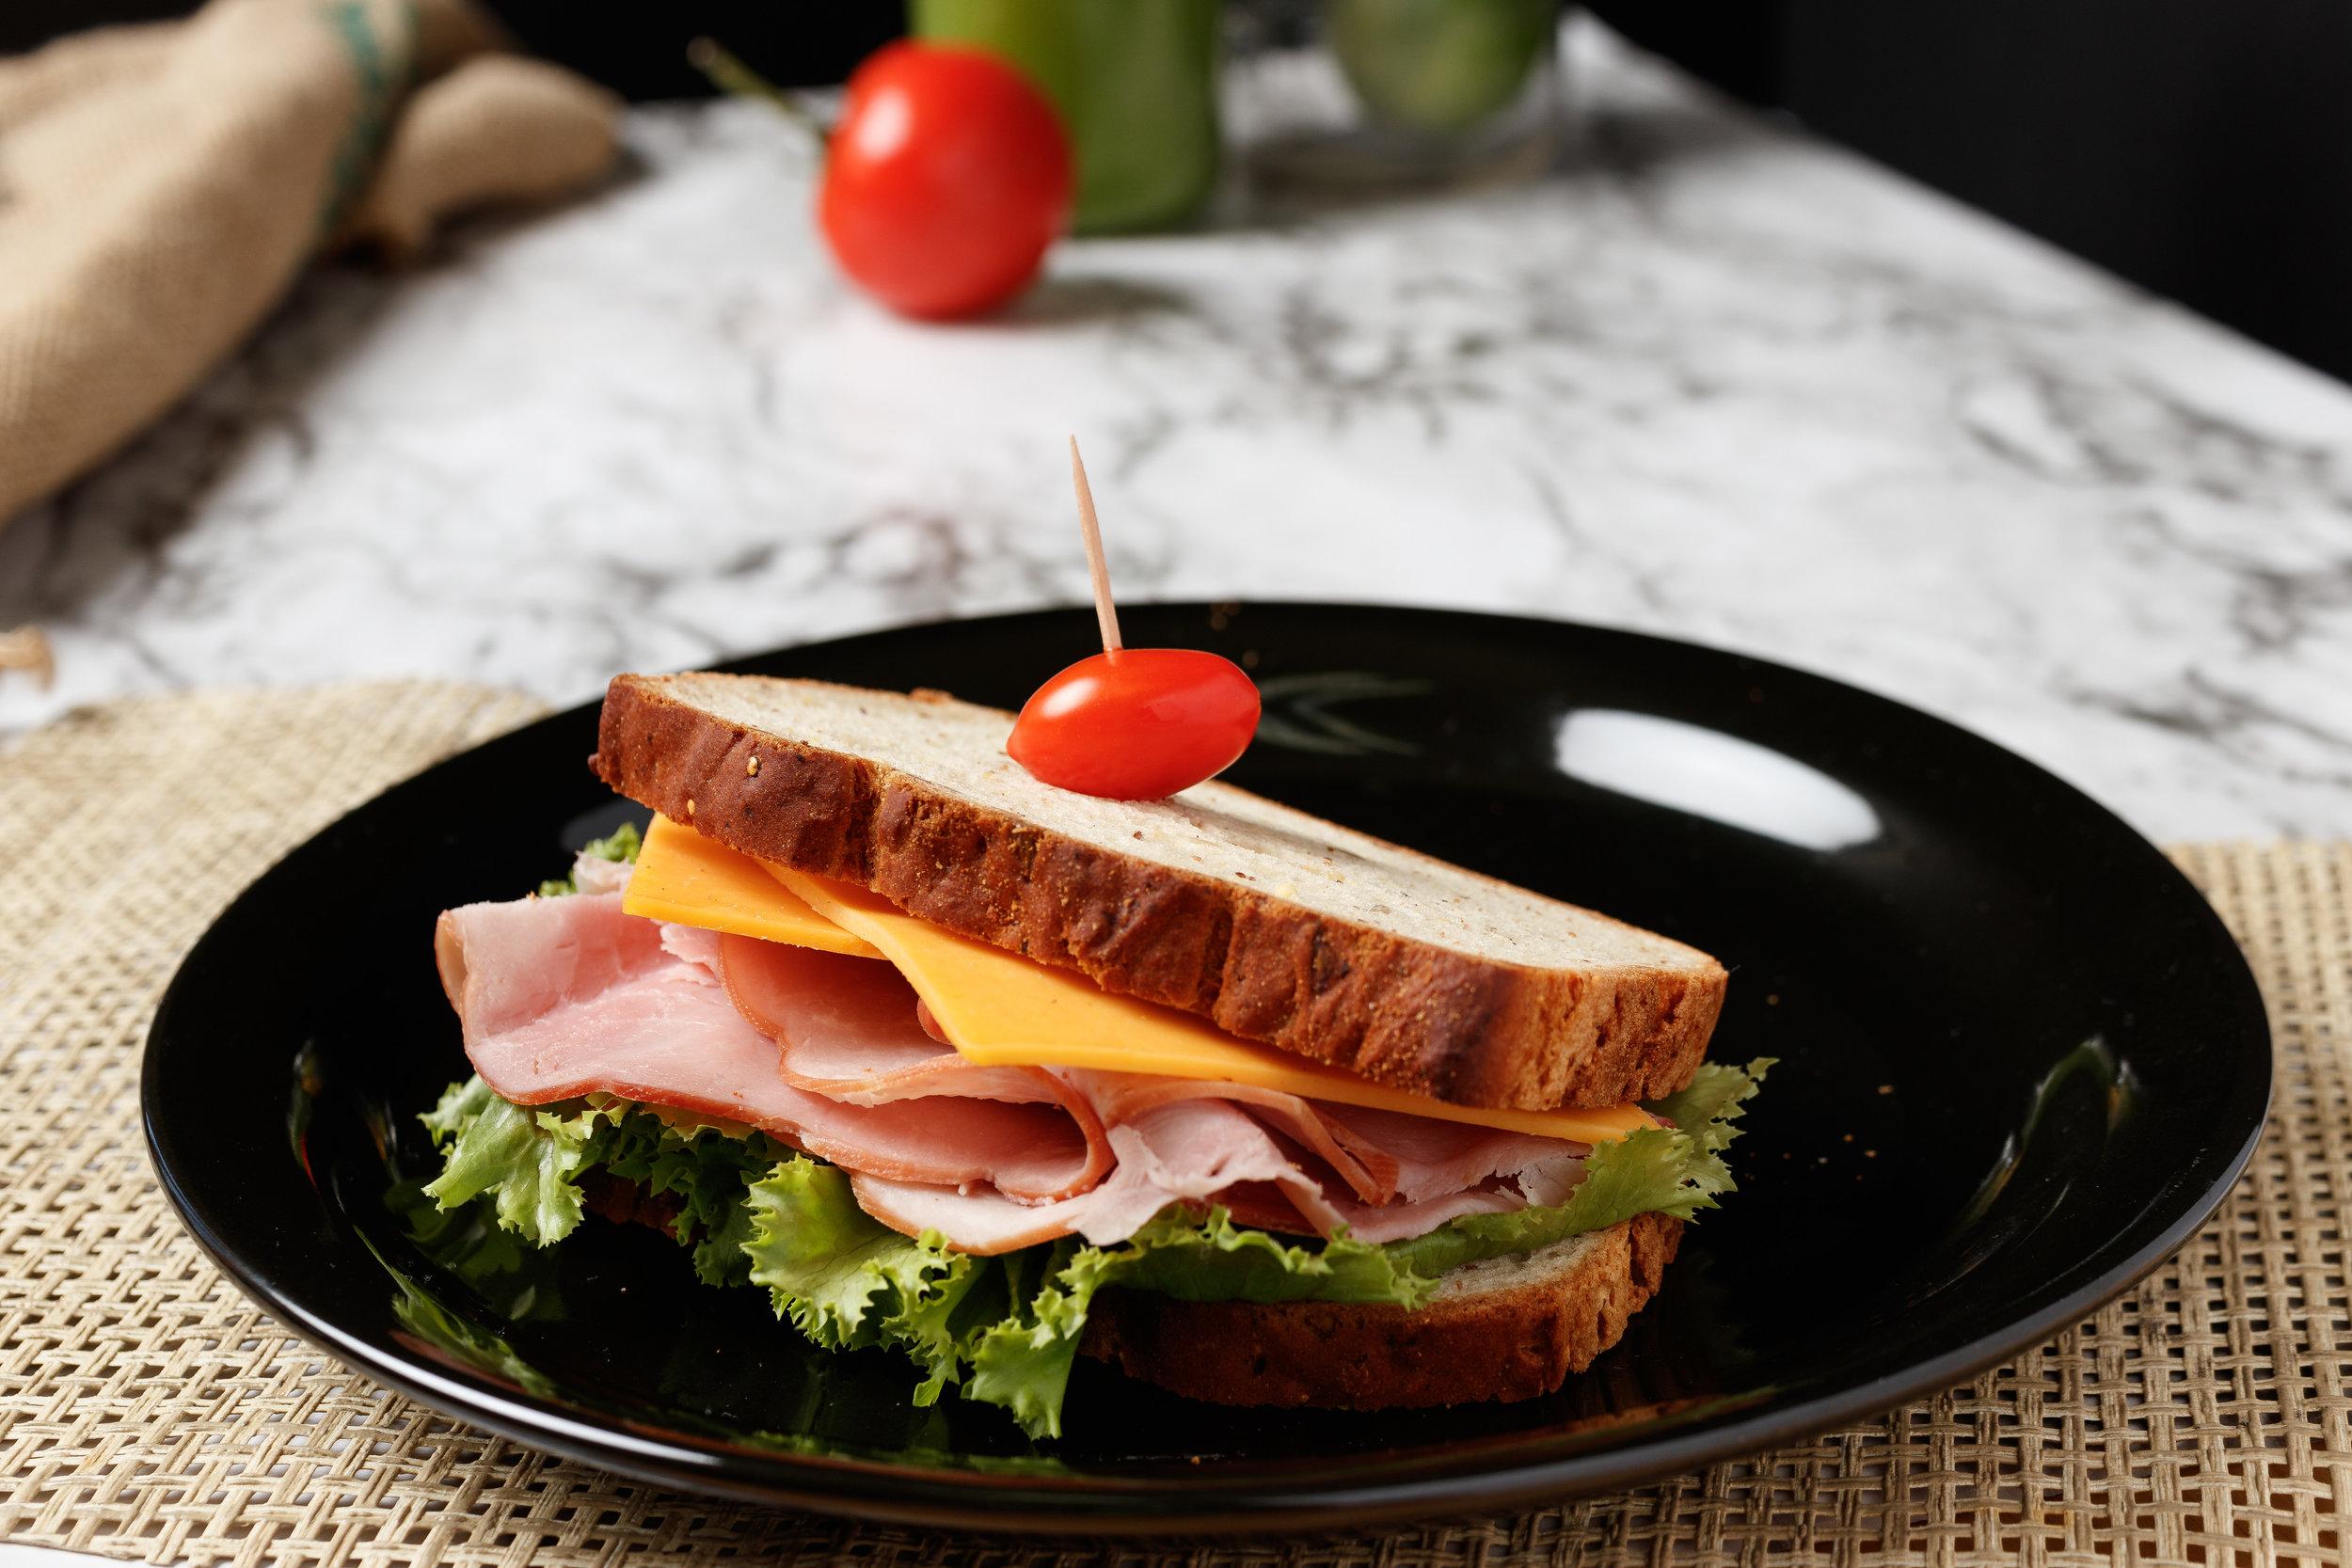 Gluten-free ham & cheese